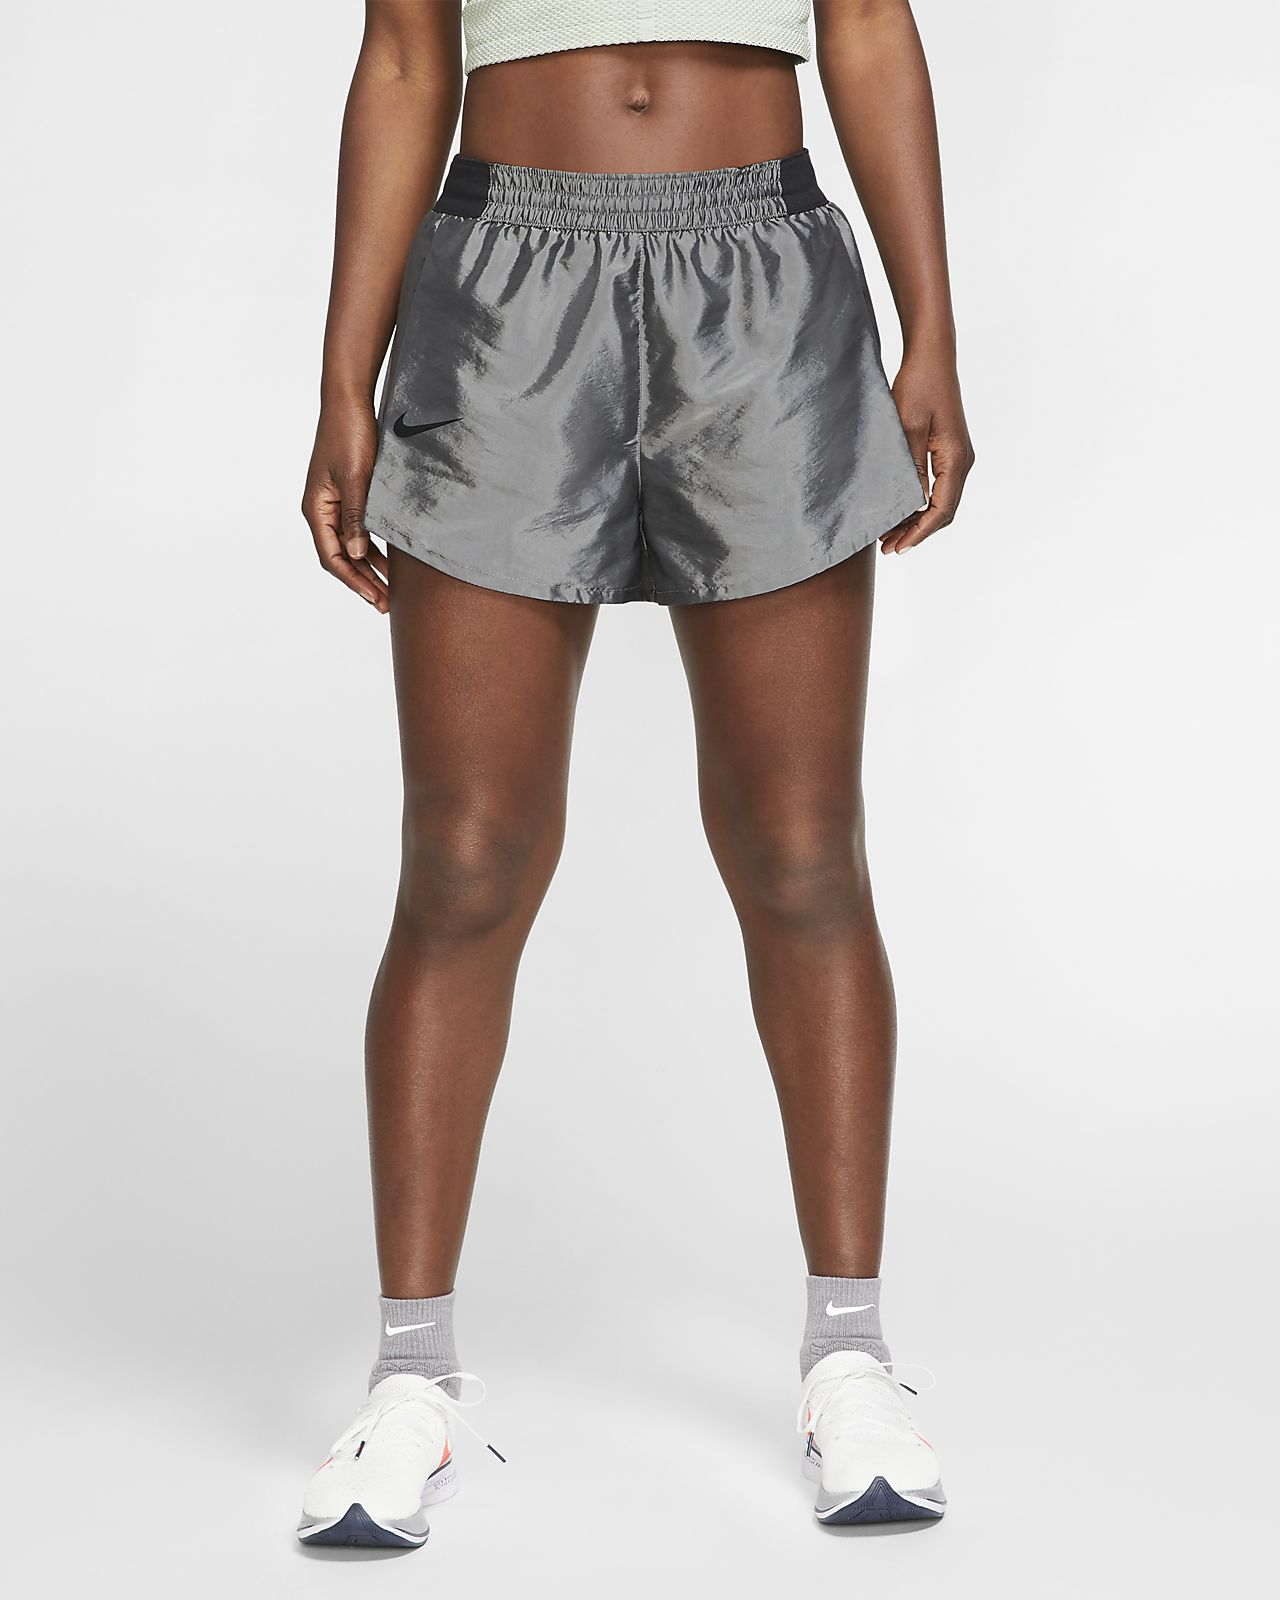 distribuidor mayorista 575d9 68ec6 Nike Tempo Lux Pantalón corto de running - Mujer